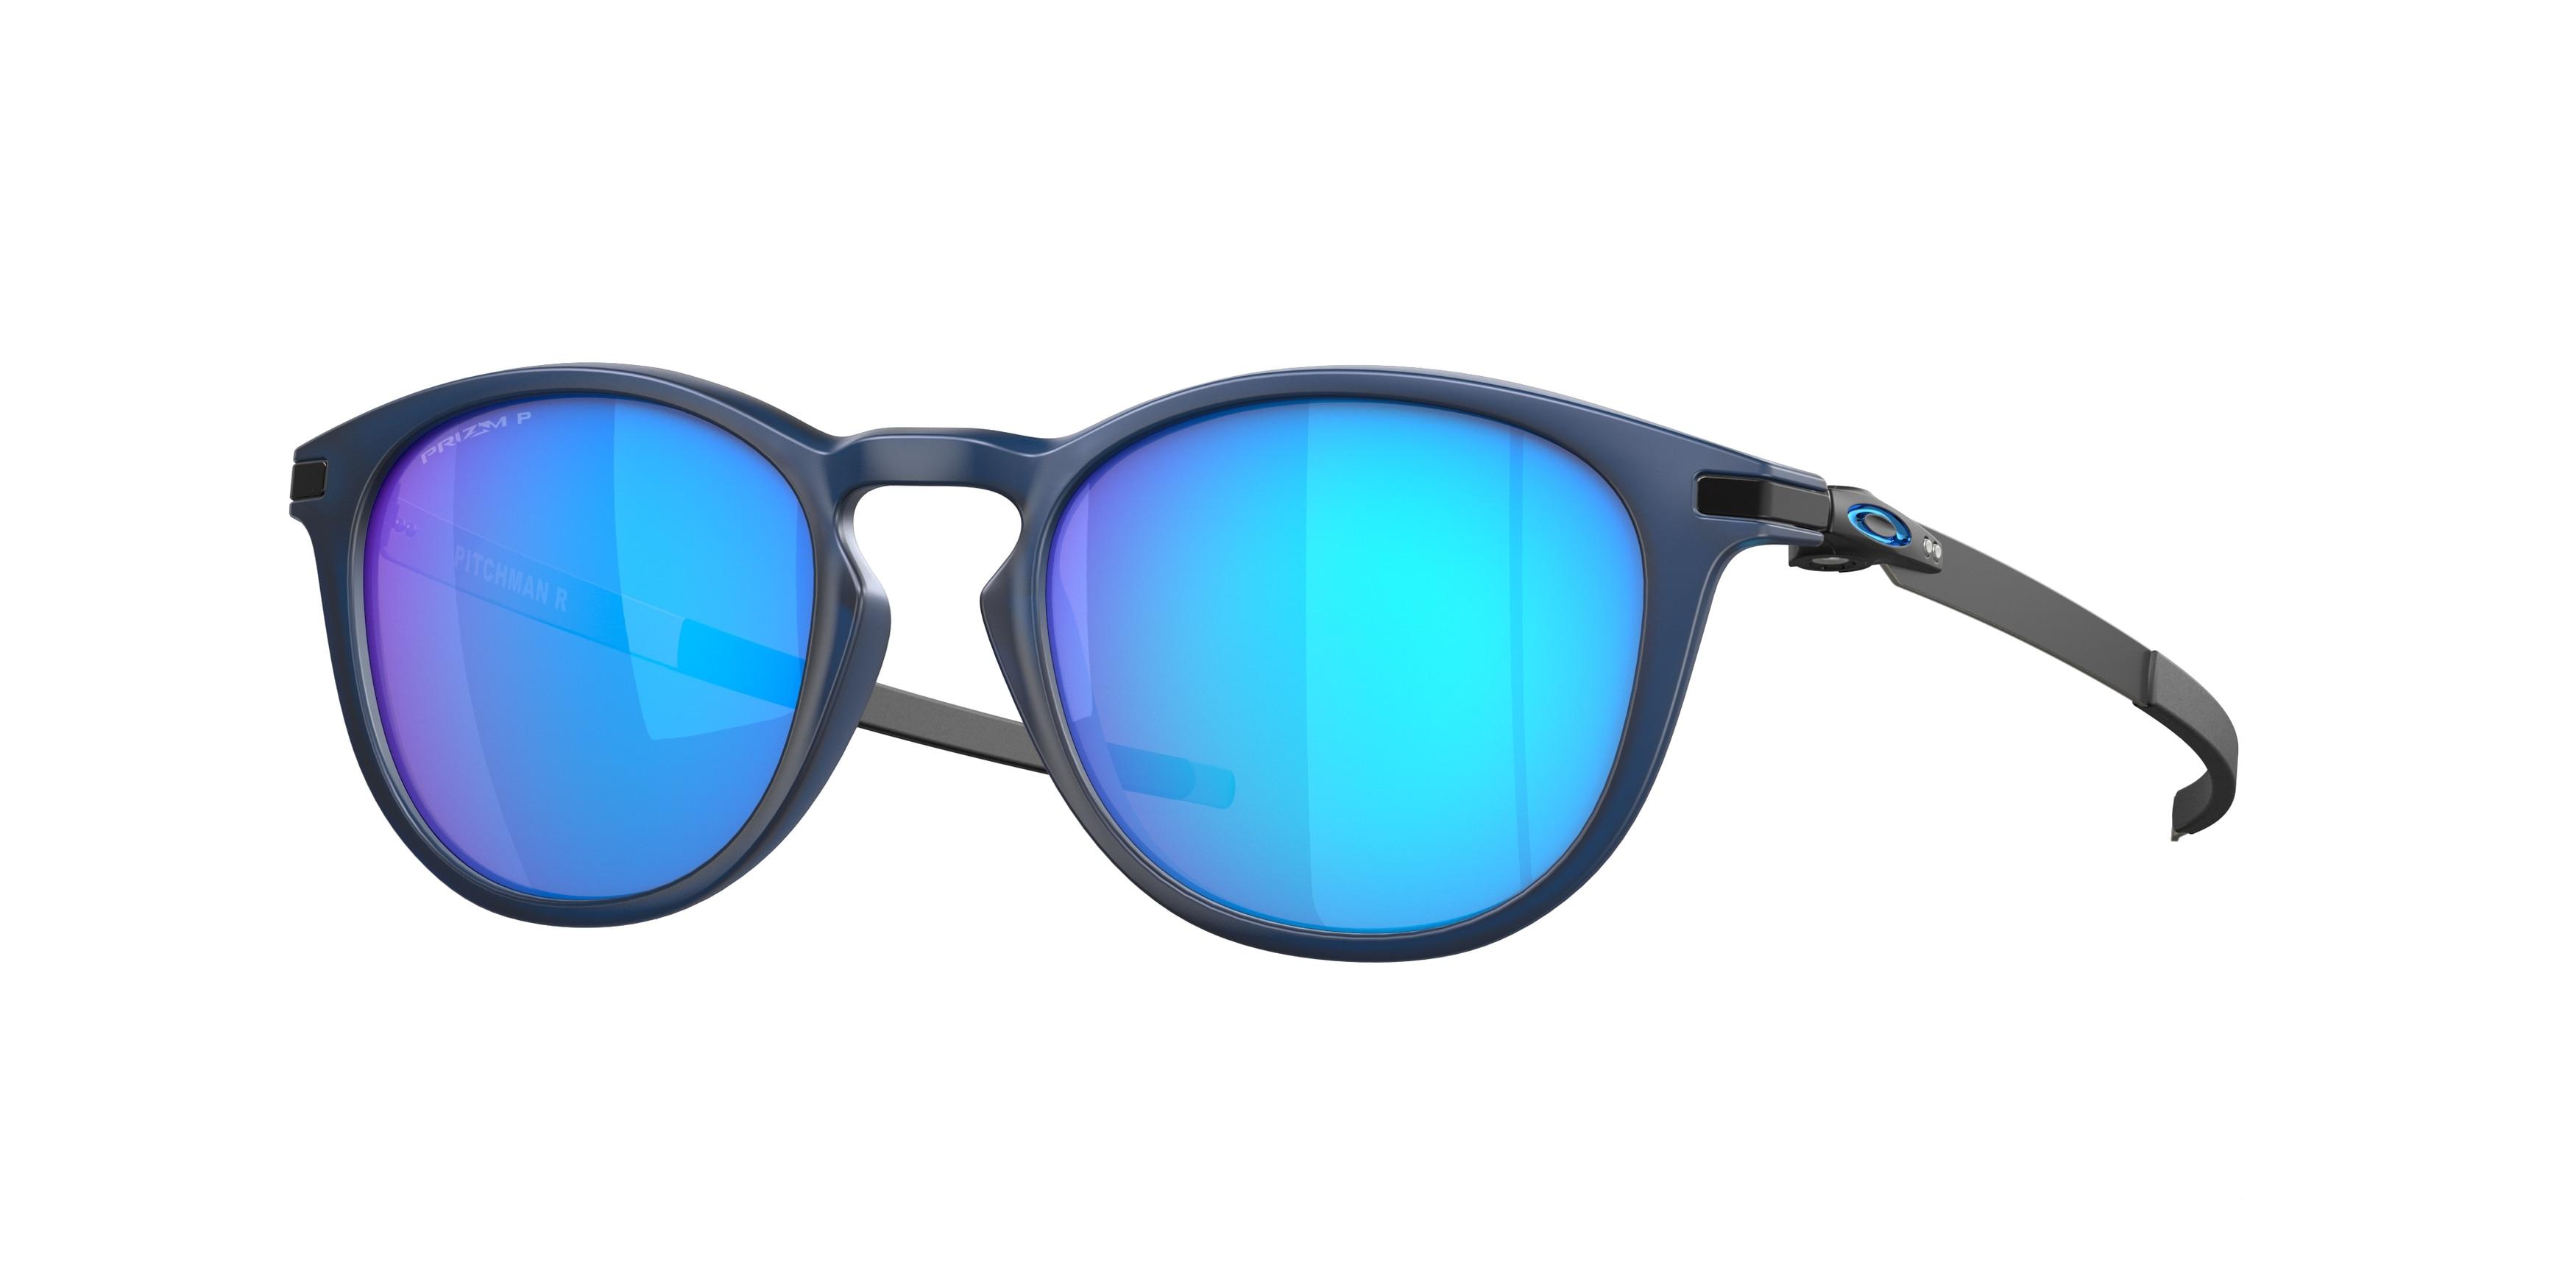 oakley_0oo9439_943913_matte_translucent_blue_polarized